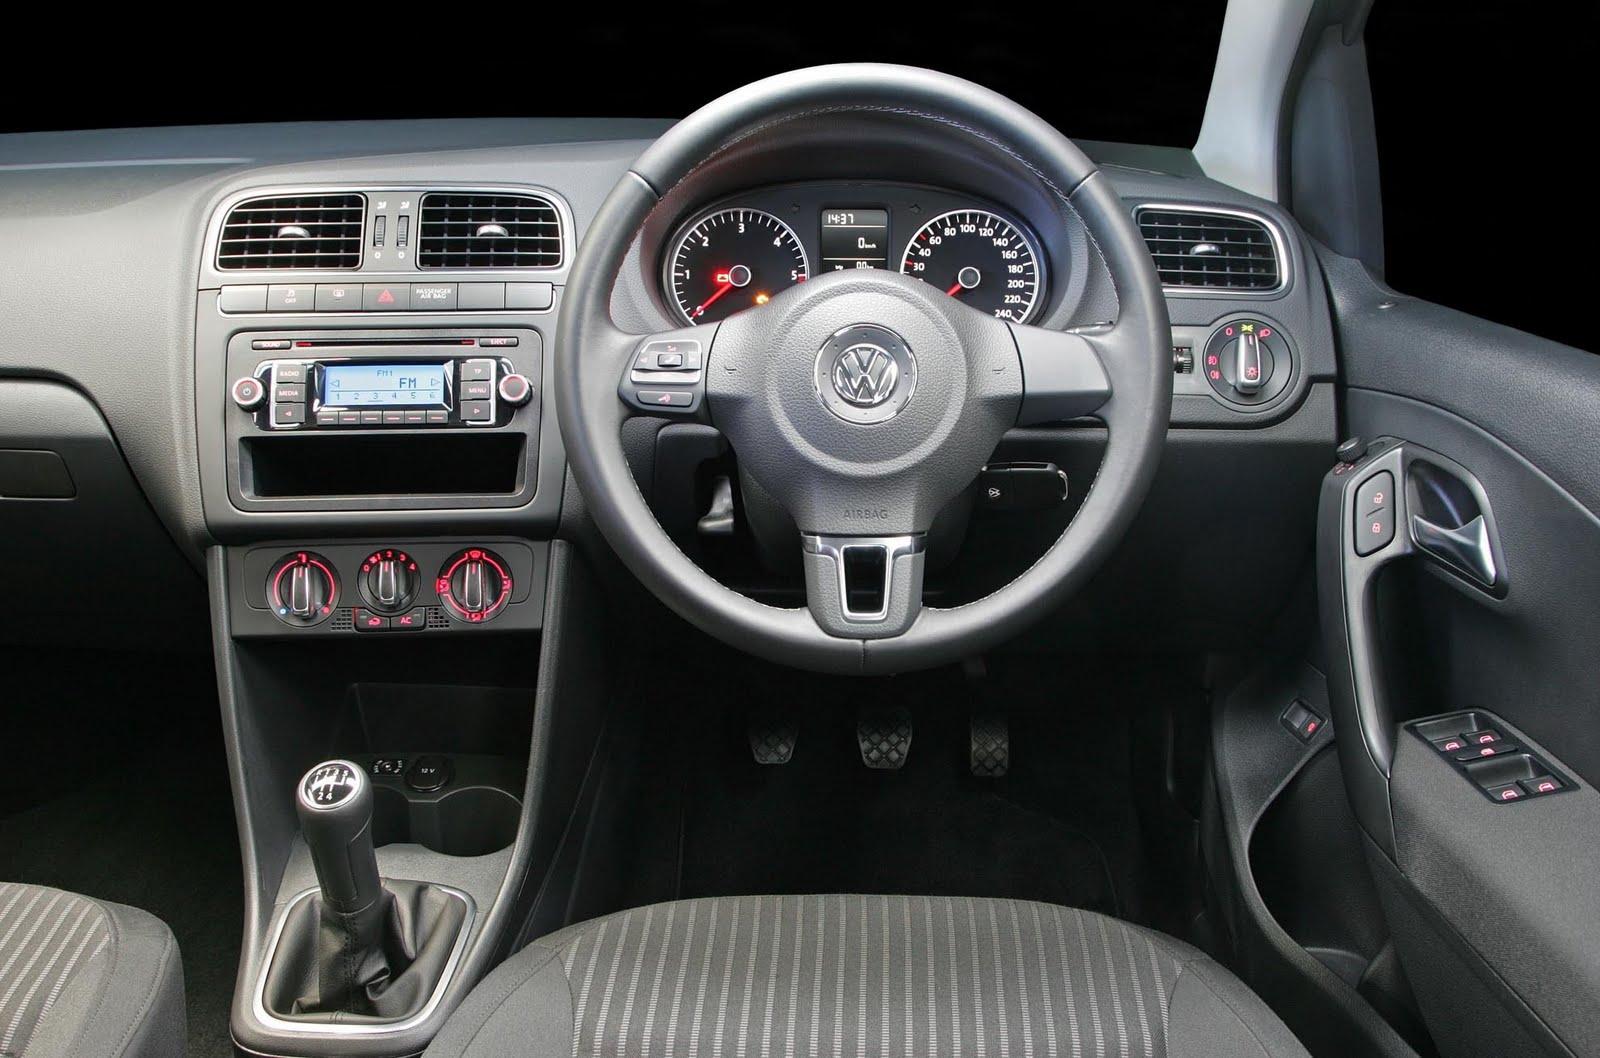 2011 Volkswagen Polo Sedan 1 6 Tdi Related Infomation